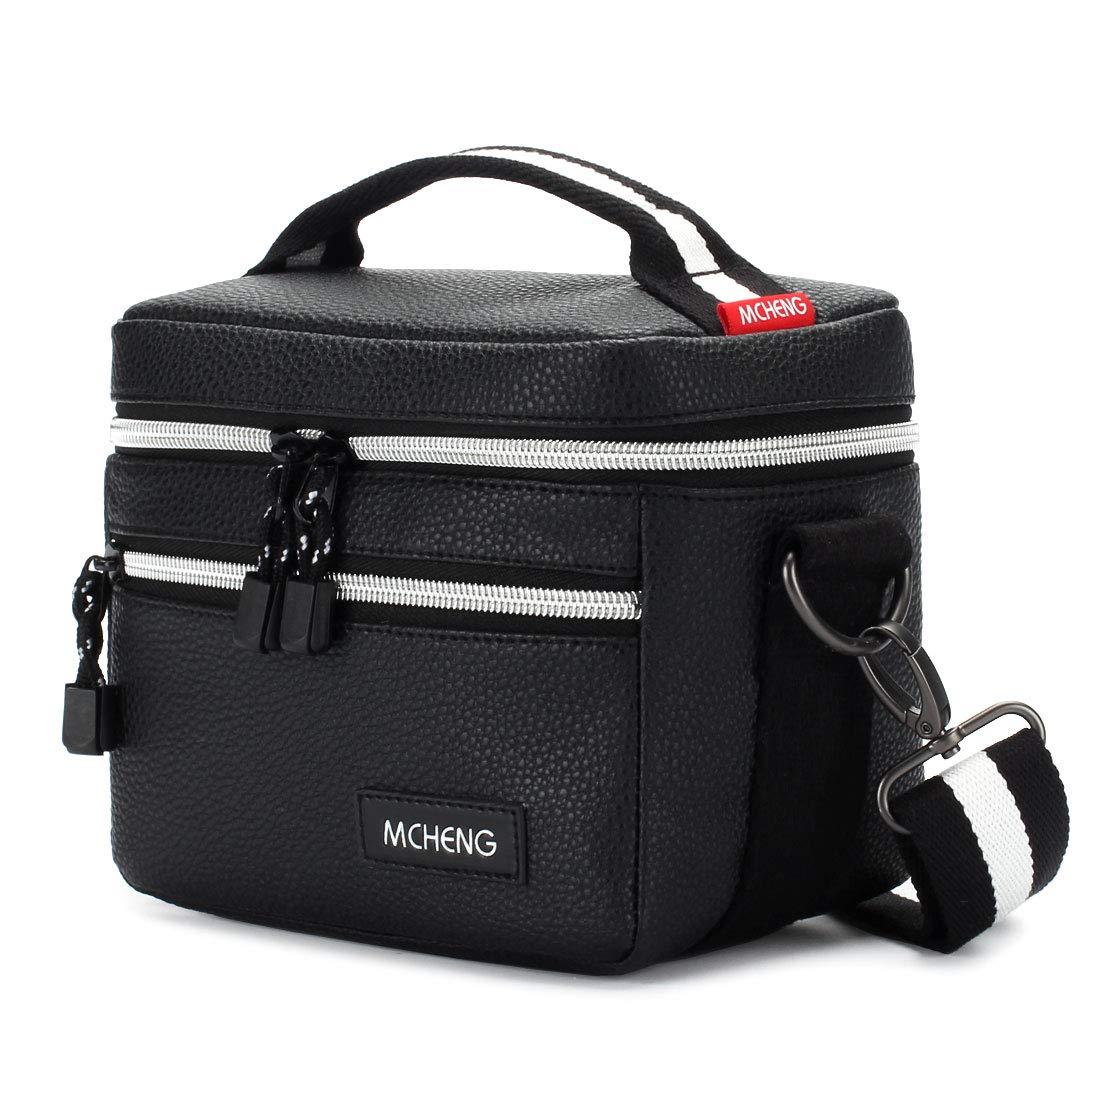 MCHENG Waterproof Shock Resistant Camera Messenger Bag with Durable Shoulder Strap for Canon EOS Rebel T6 PowerShot G7 X Mark II / Nikon D750 / SONY Cyber-Shot DSC-HX400V / Panasonic LUMIX GH5, Black